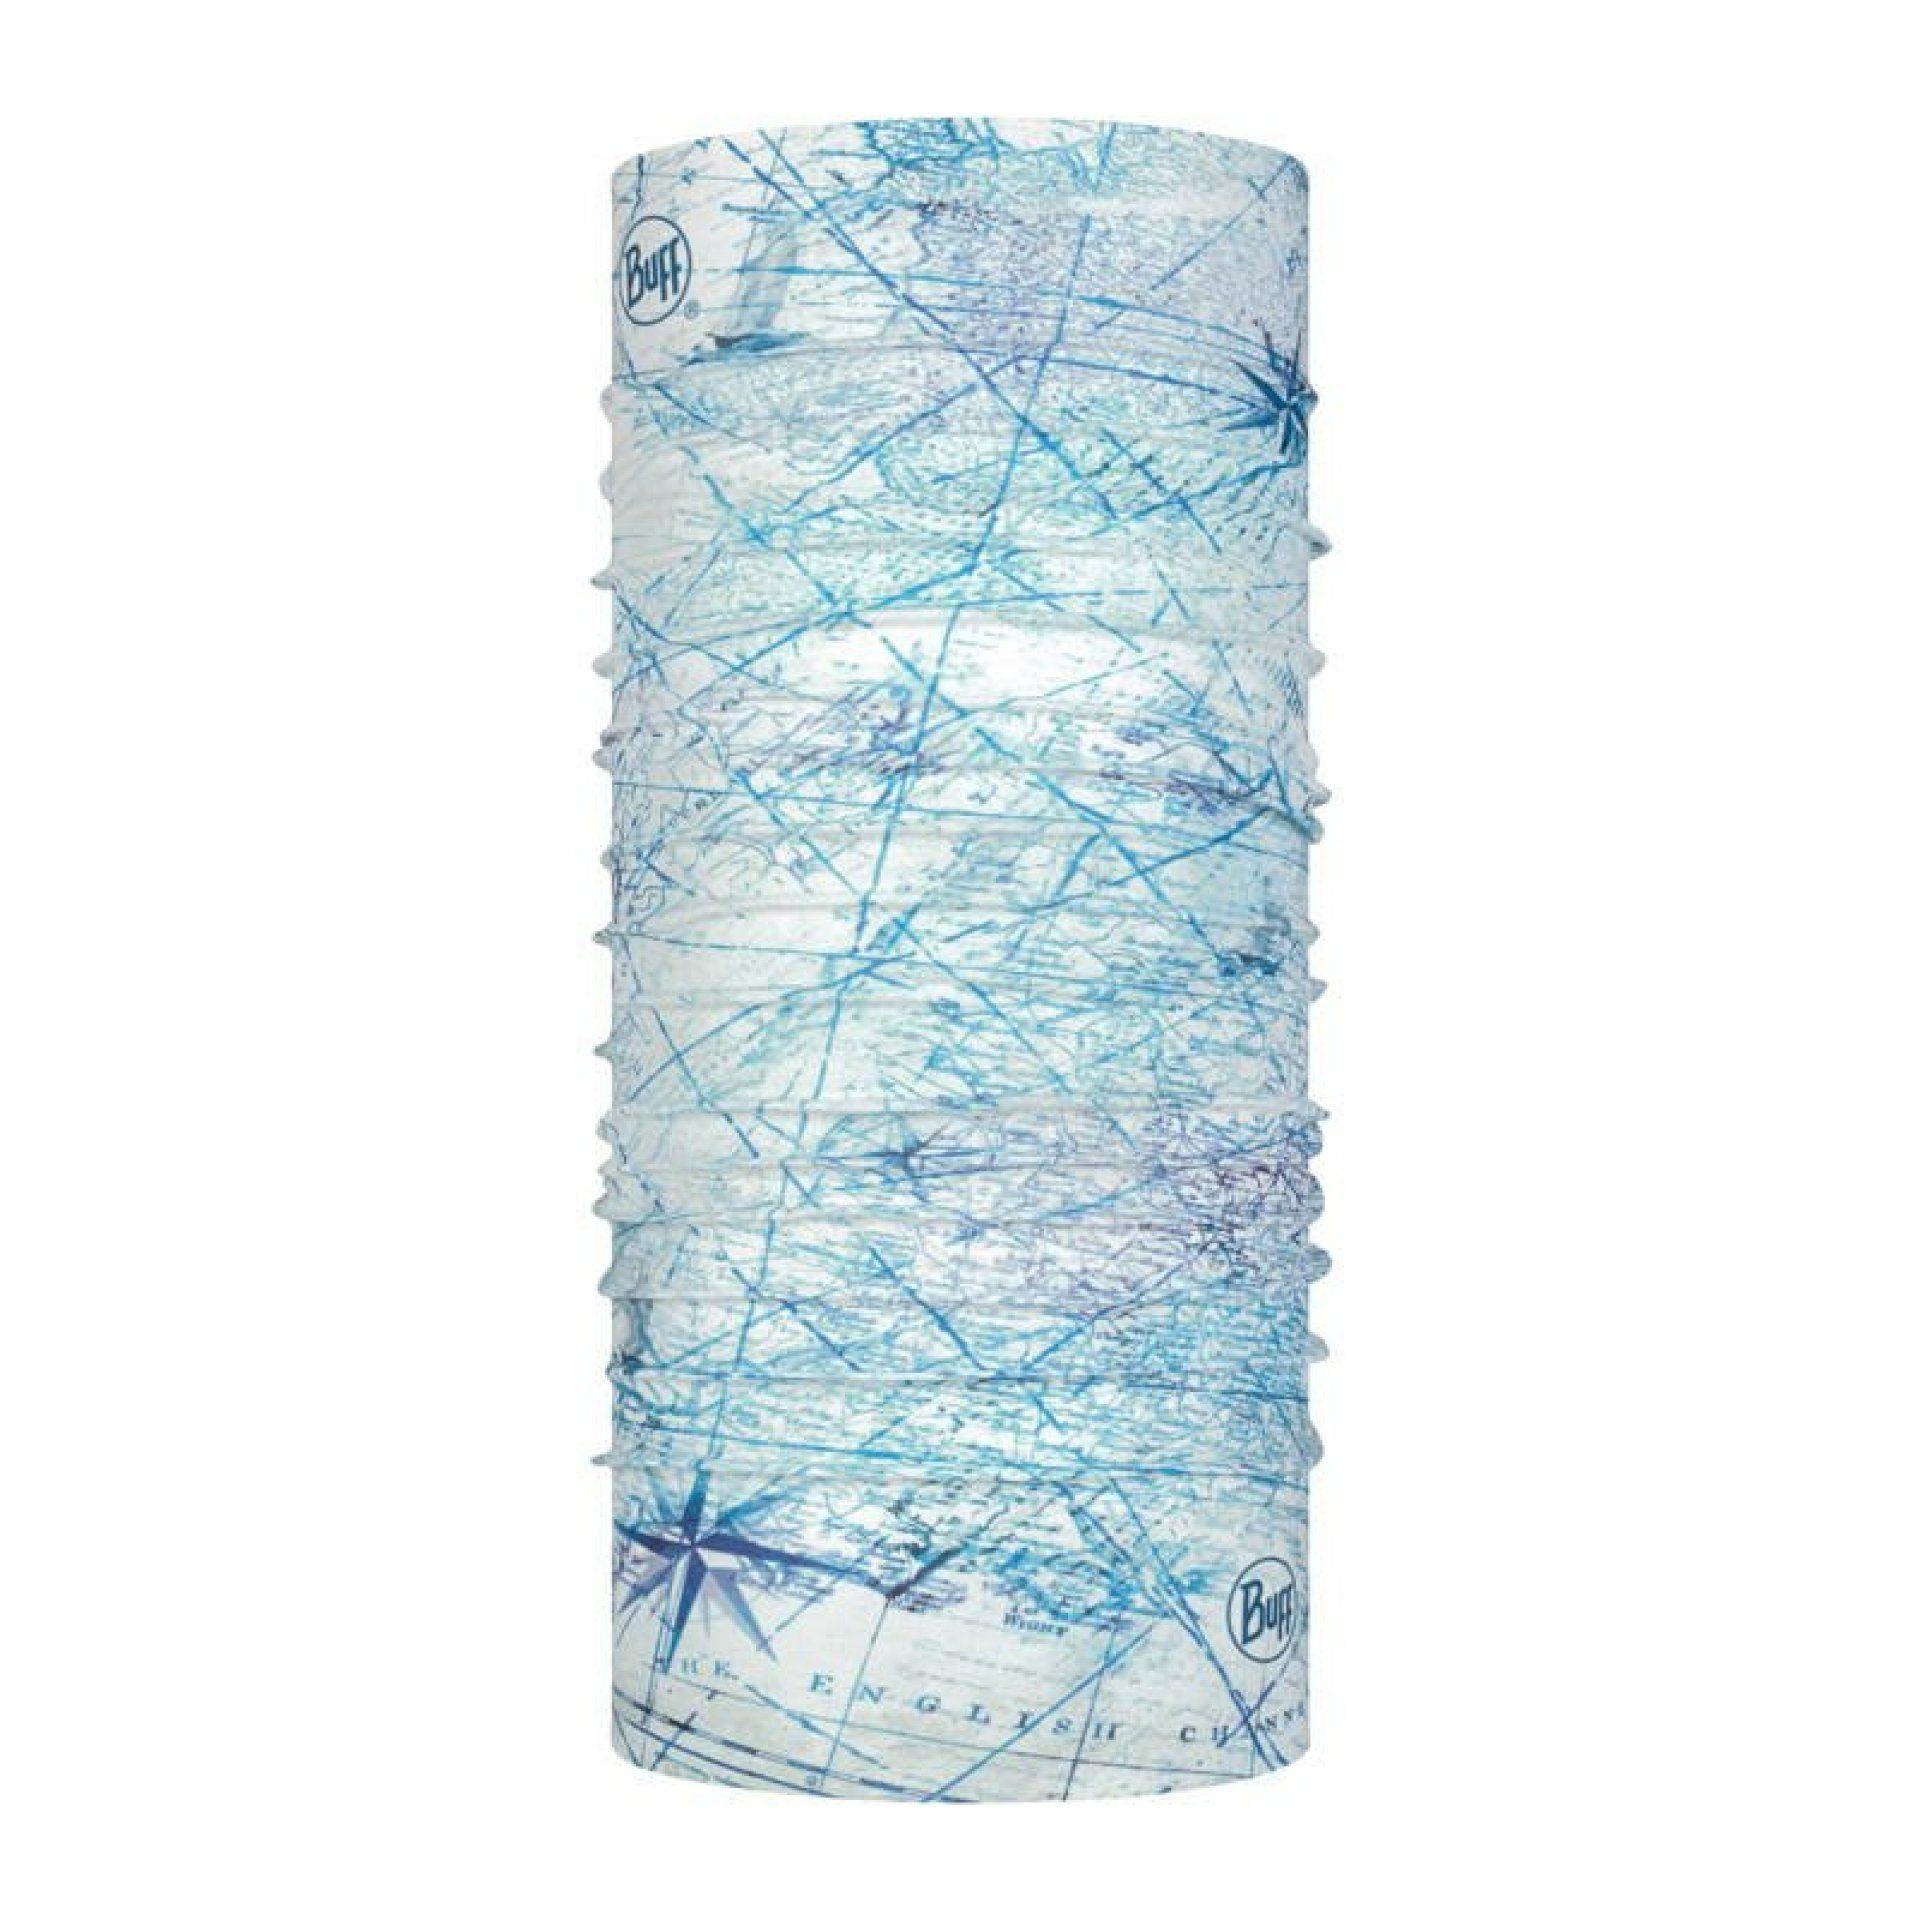 CHUSTA BUFF ORIGINAL NAUTICAL S-MAP BLUE